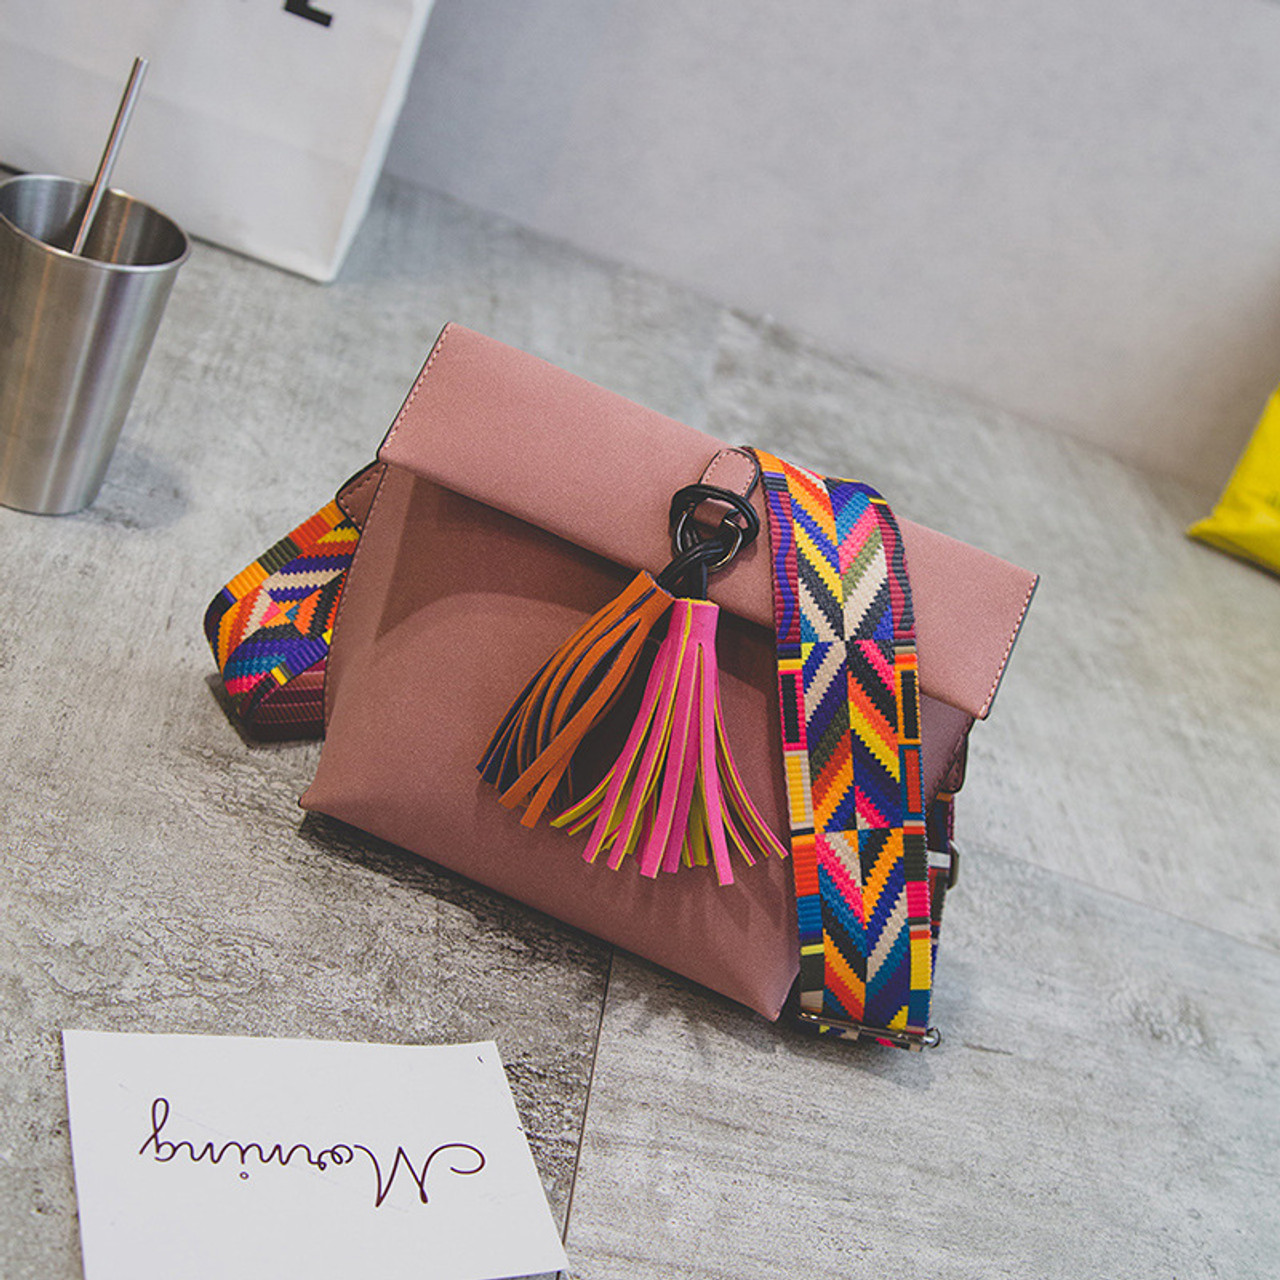 ... Miyahouse Women Scrub Leather Design Crossbody Bag Girls With Tassel  Colorful Strap Shoulder Bag Female Small ... 0cad7ed1c99c8